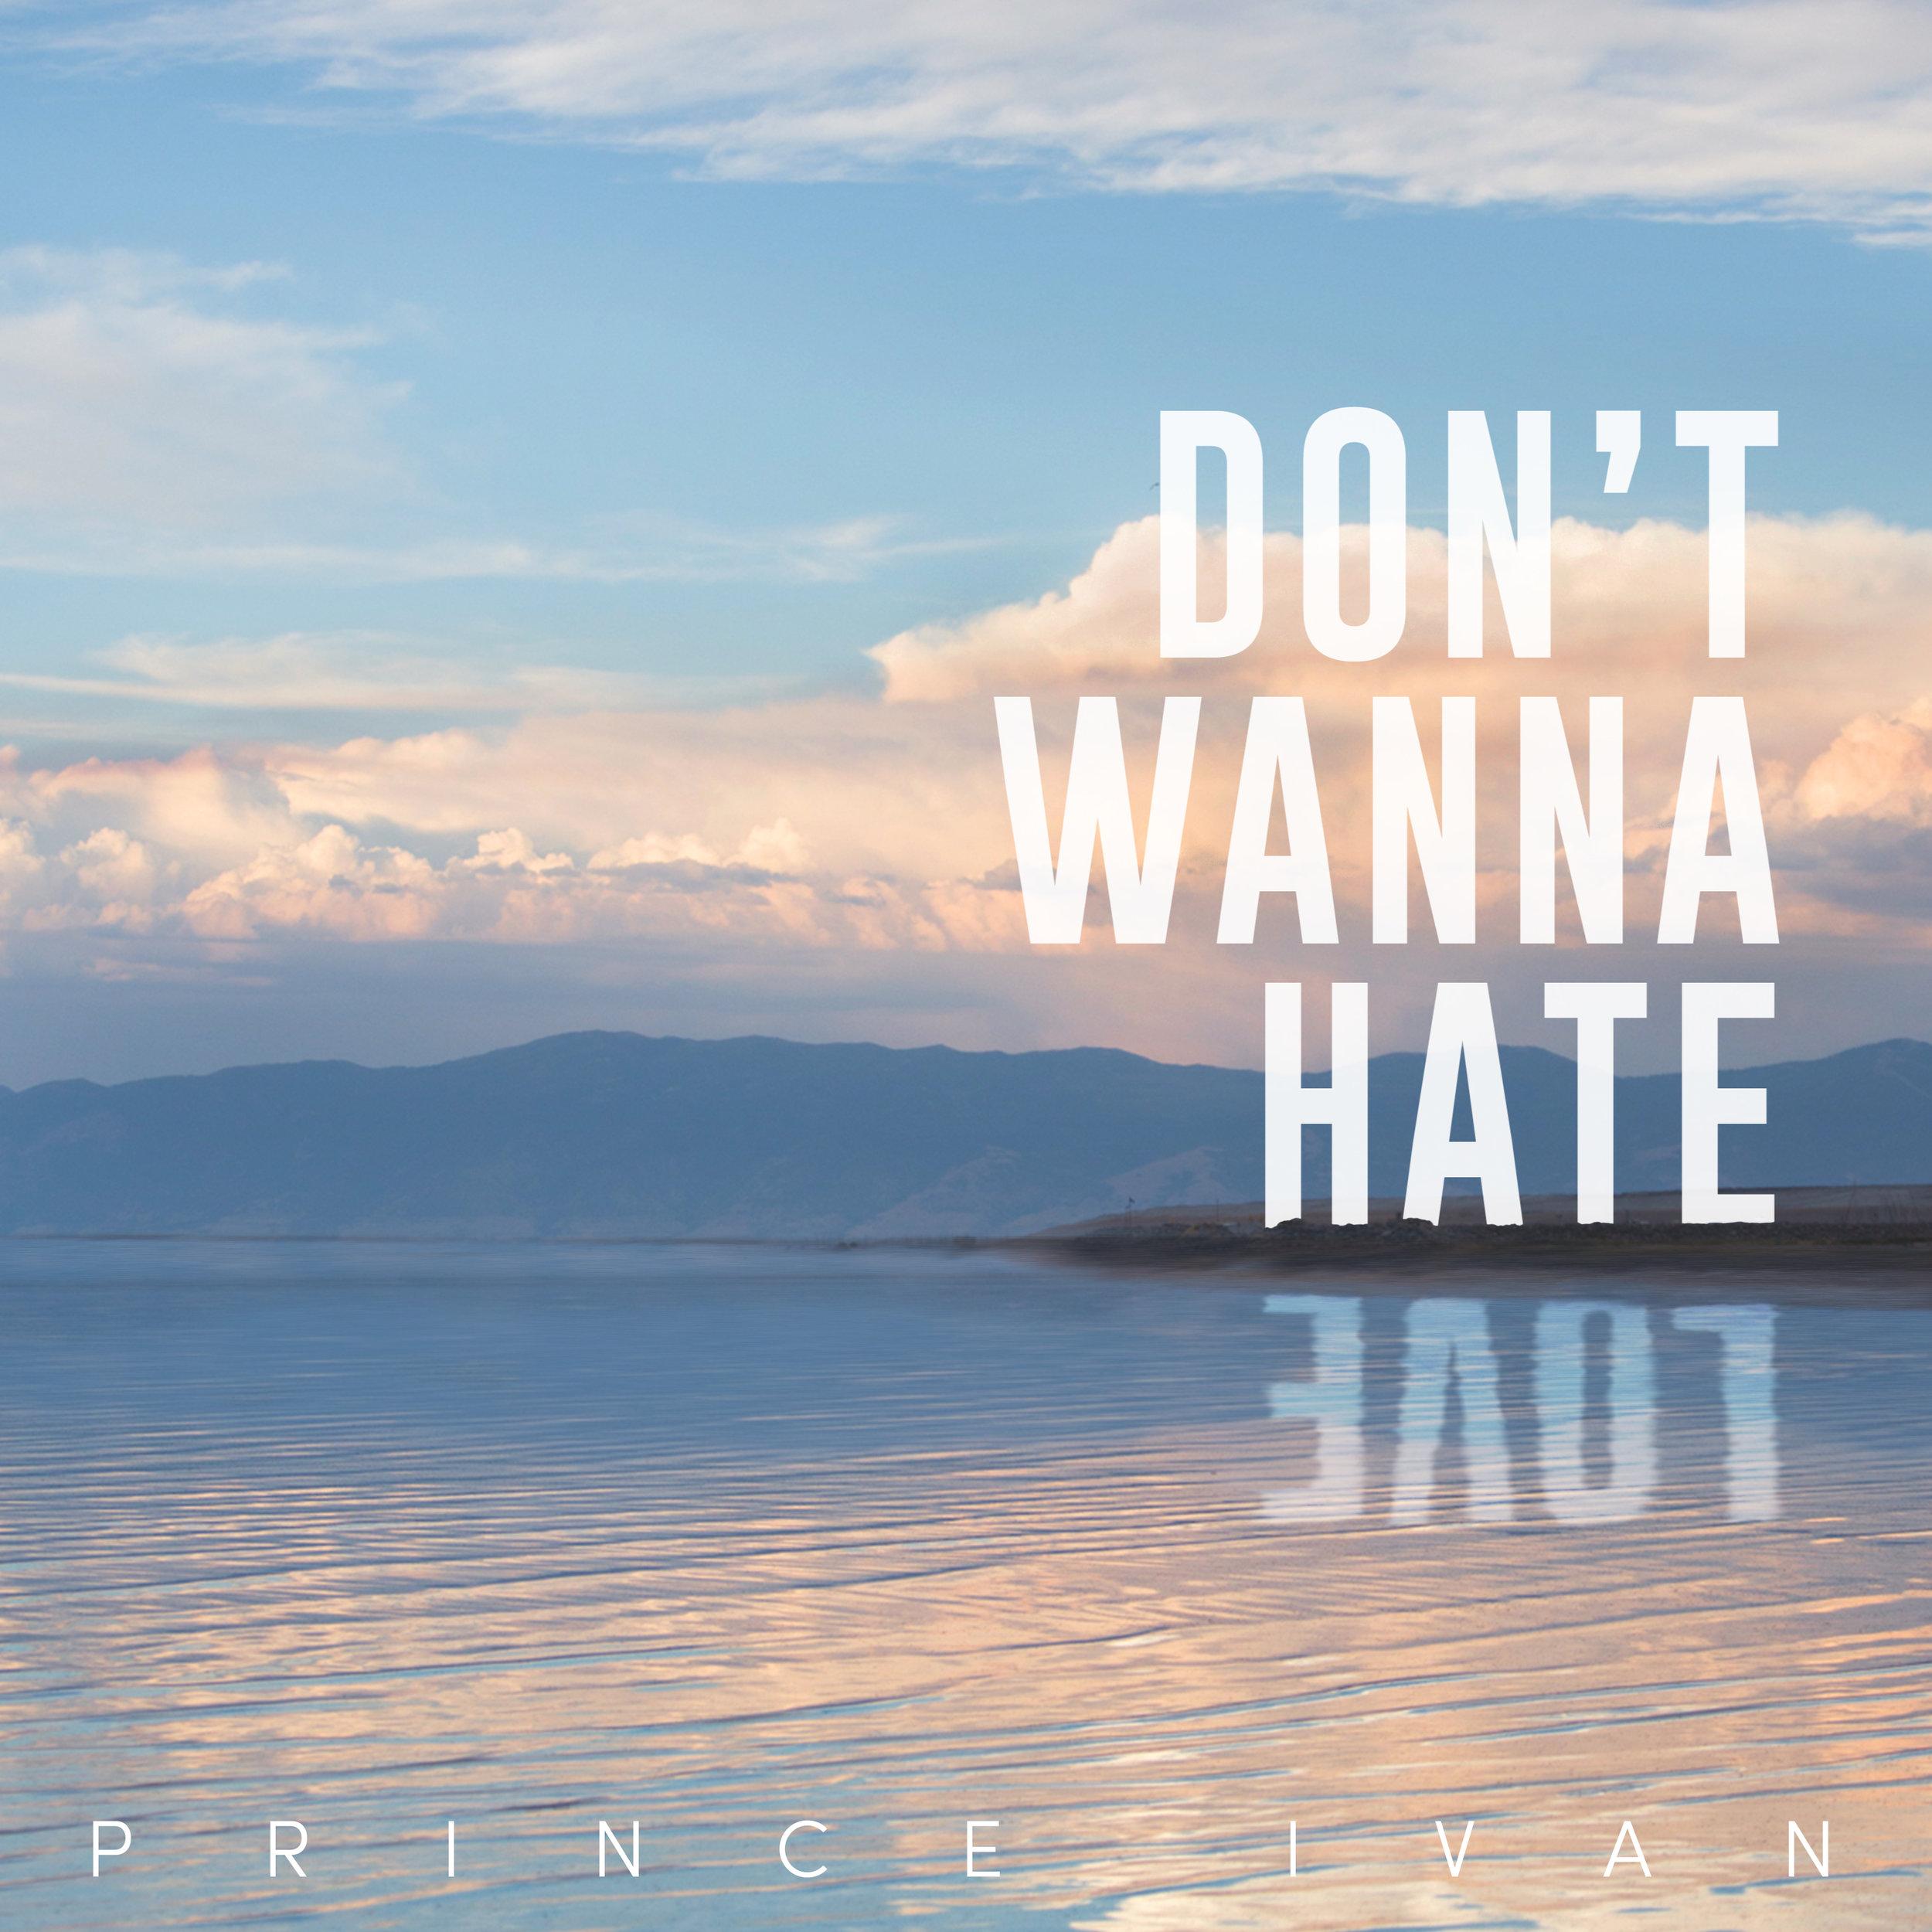 PI_Don'tWannaHateLove_AlbumCover_1.jpg